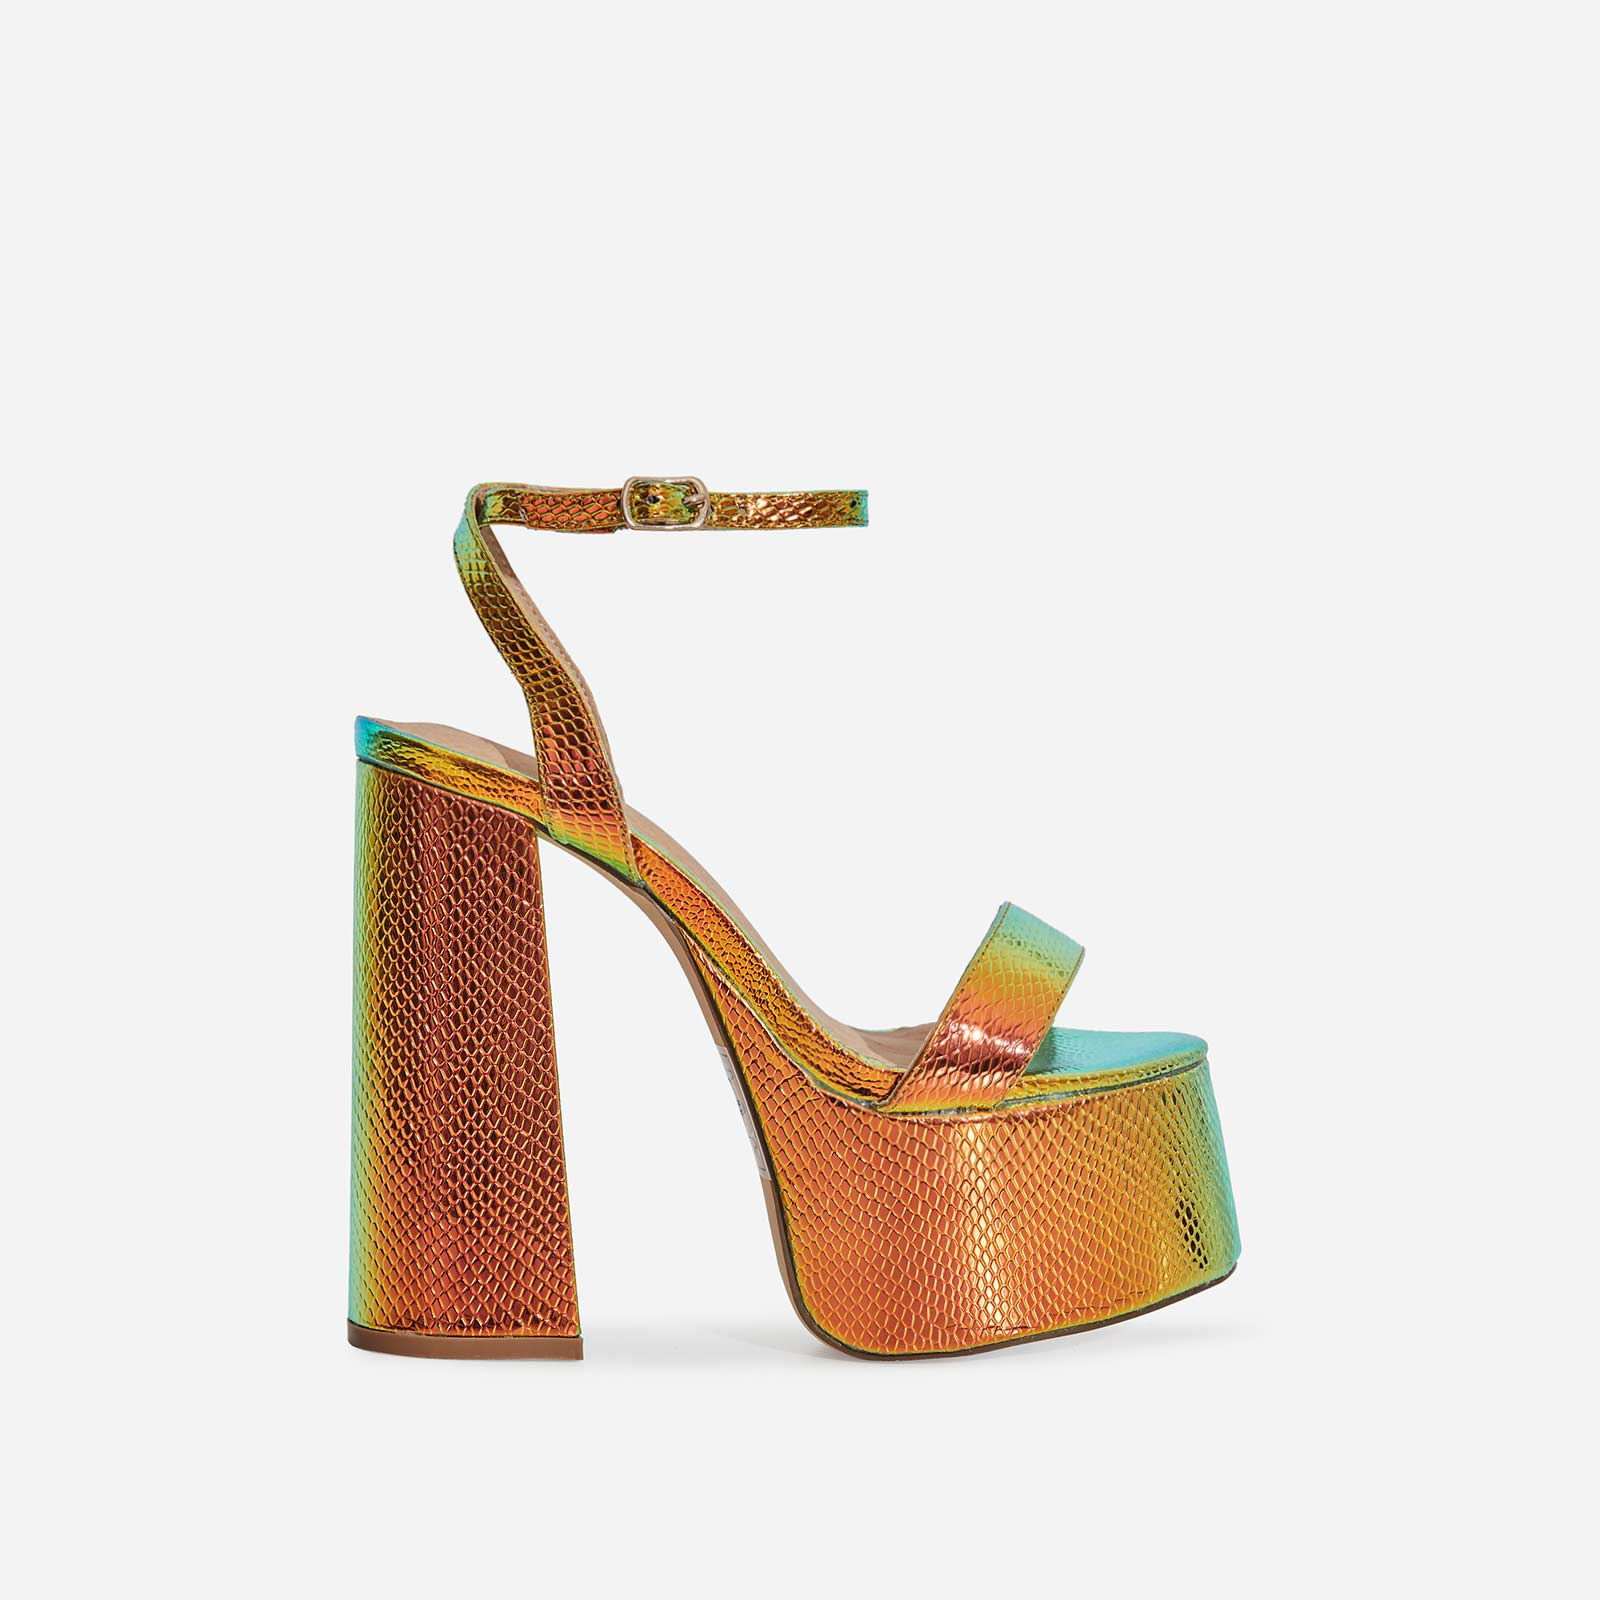 Lady Platform Block Heel In Metallic Green Snake Print Faux Leather